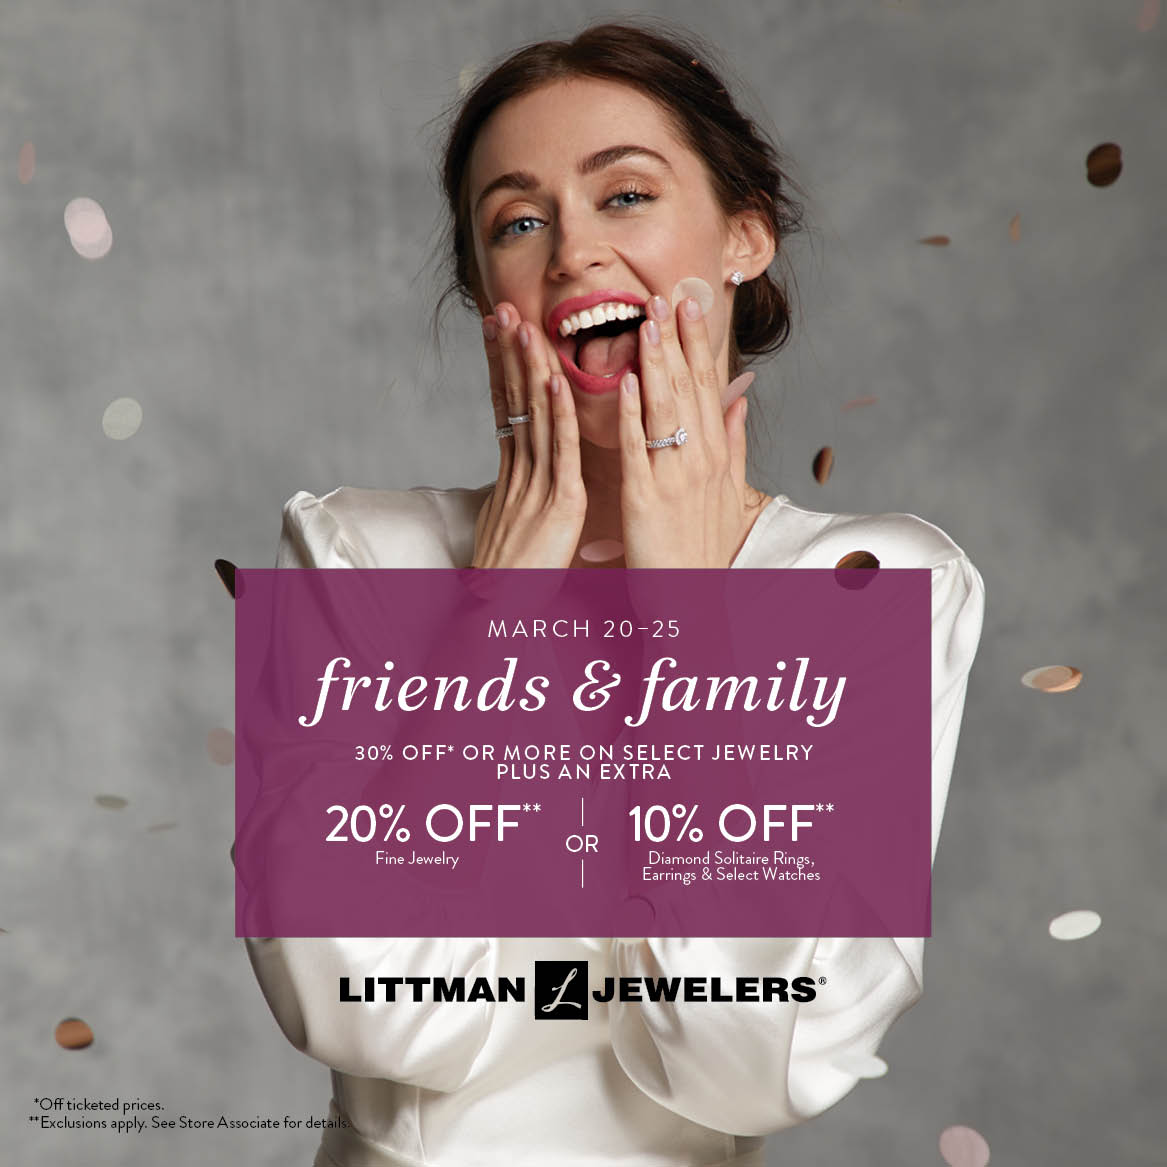 Littman friendsandfamily